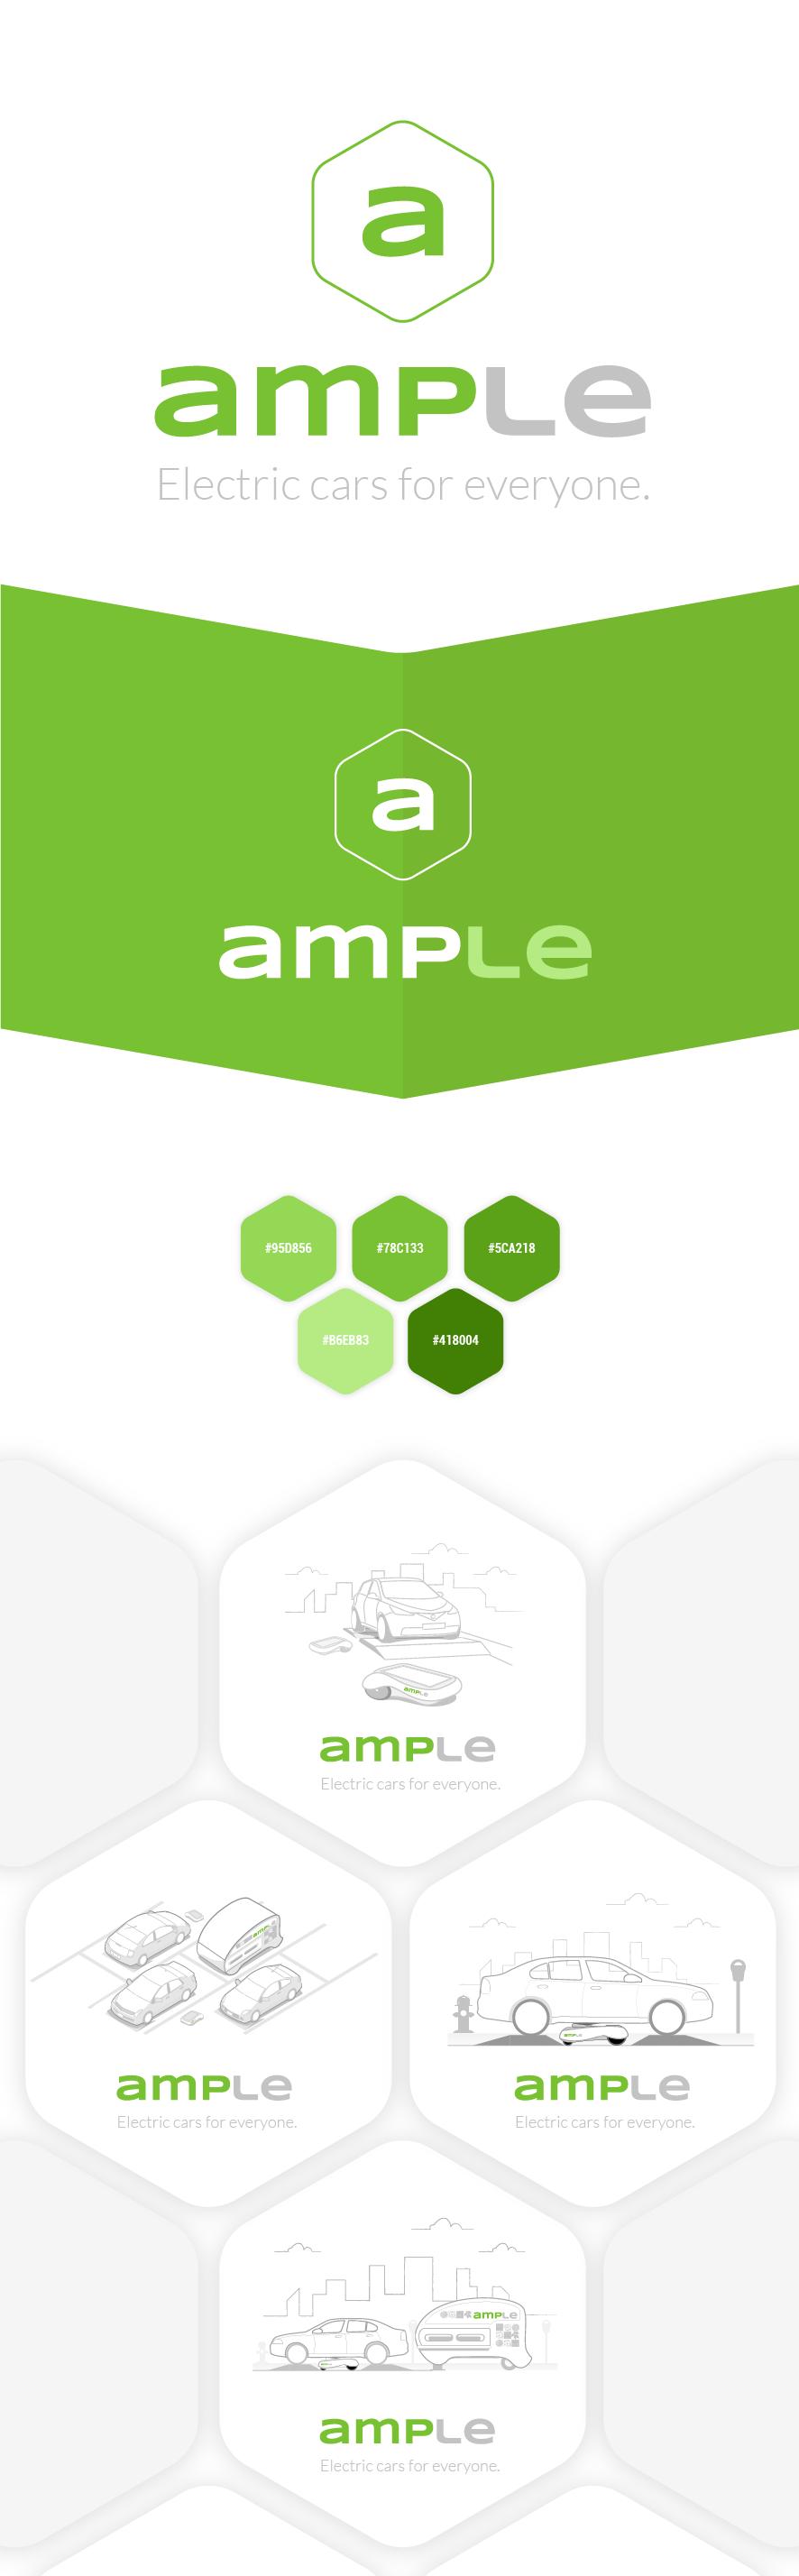 ample_vert